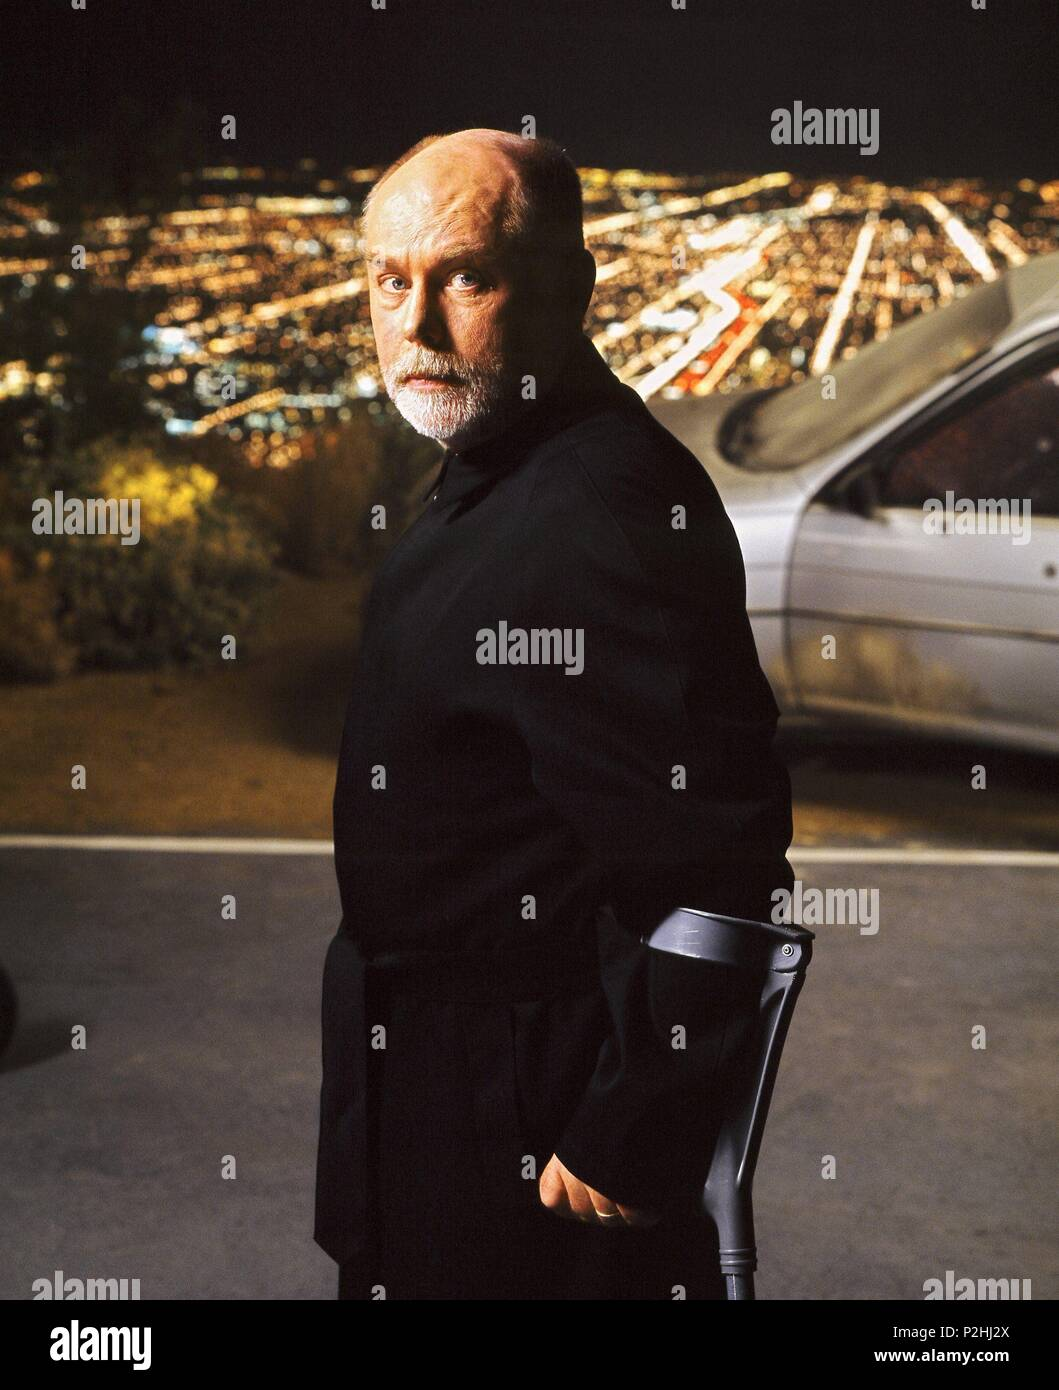 Original Film Title: CSI: CRIME SCENE INVESTIGATION-TV.  English Title: CSI: CRIME SCENE INVESTIGATION.  Year: 2000.  Stars: ROBERT DAVID HALL. Credit: CBS TELEVISION / Album Stock Photo